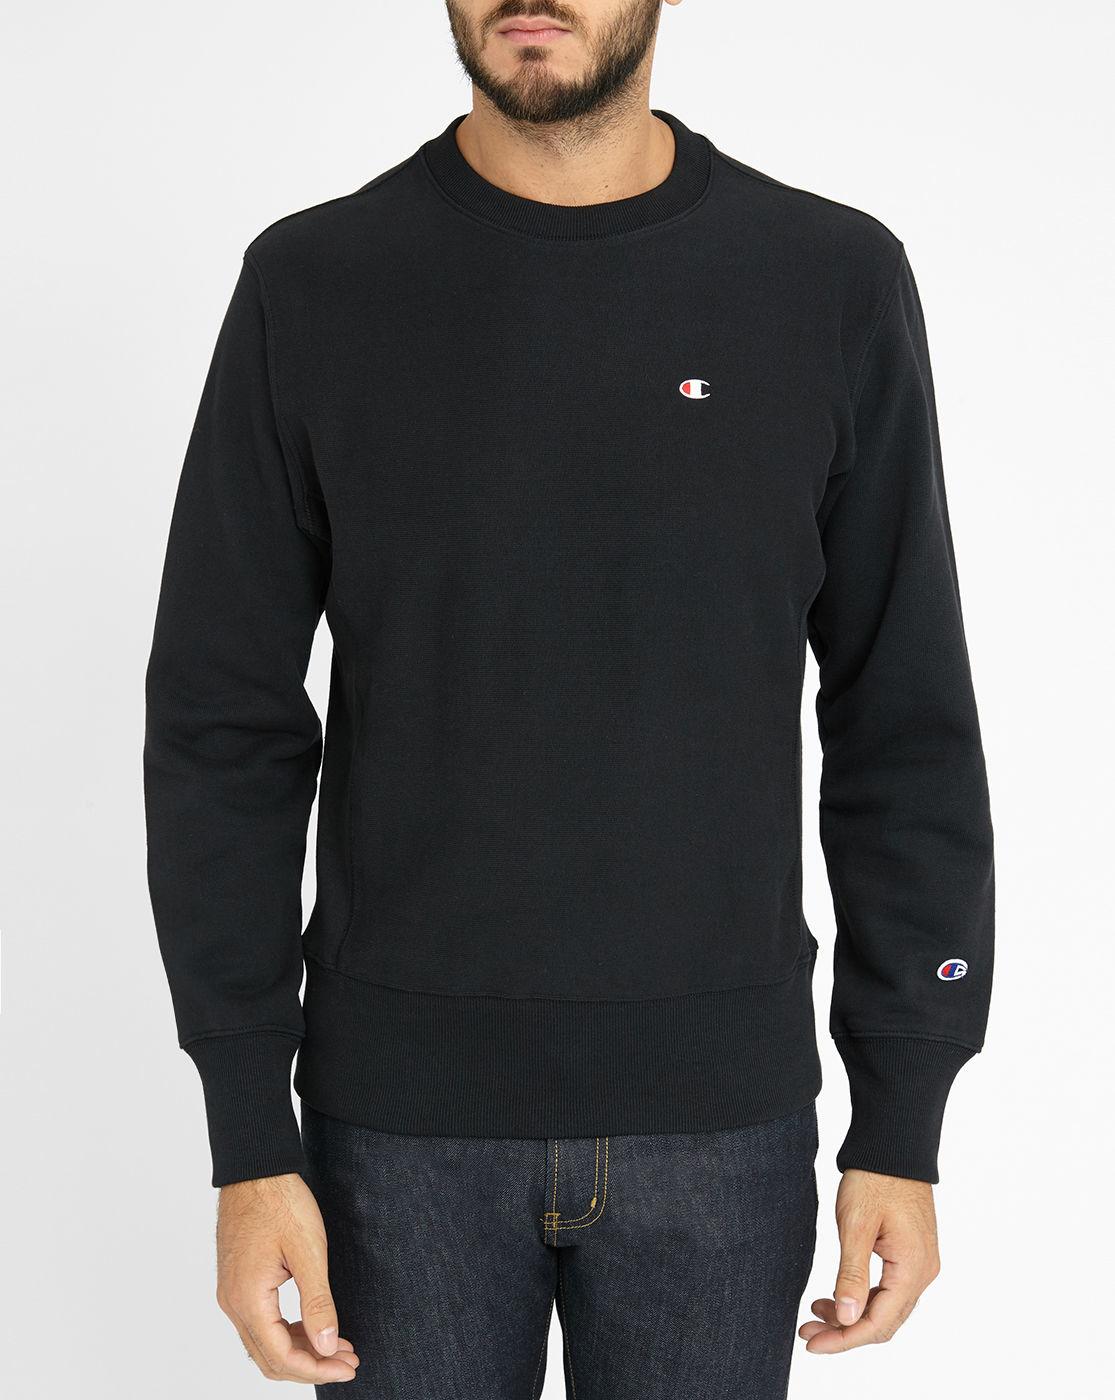 champion black original reverse weave sweatshirt in black for men lyst. Black Bedroom Furniture Sets. Home Design Ideas